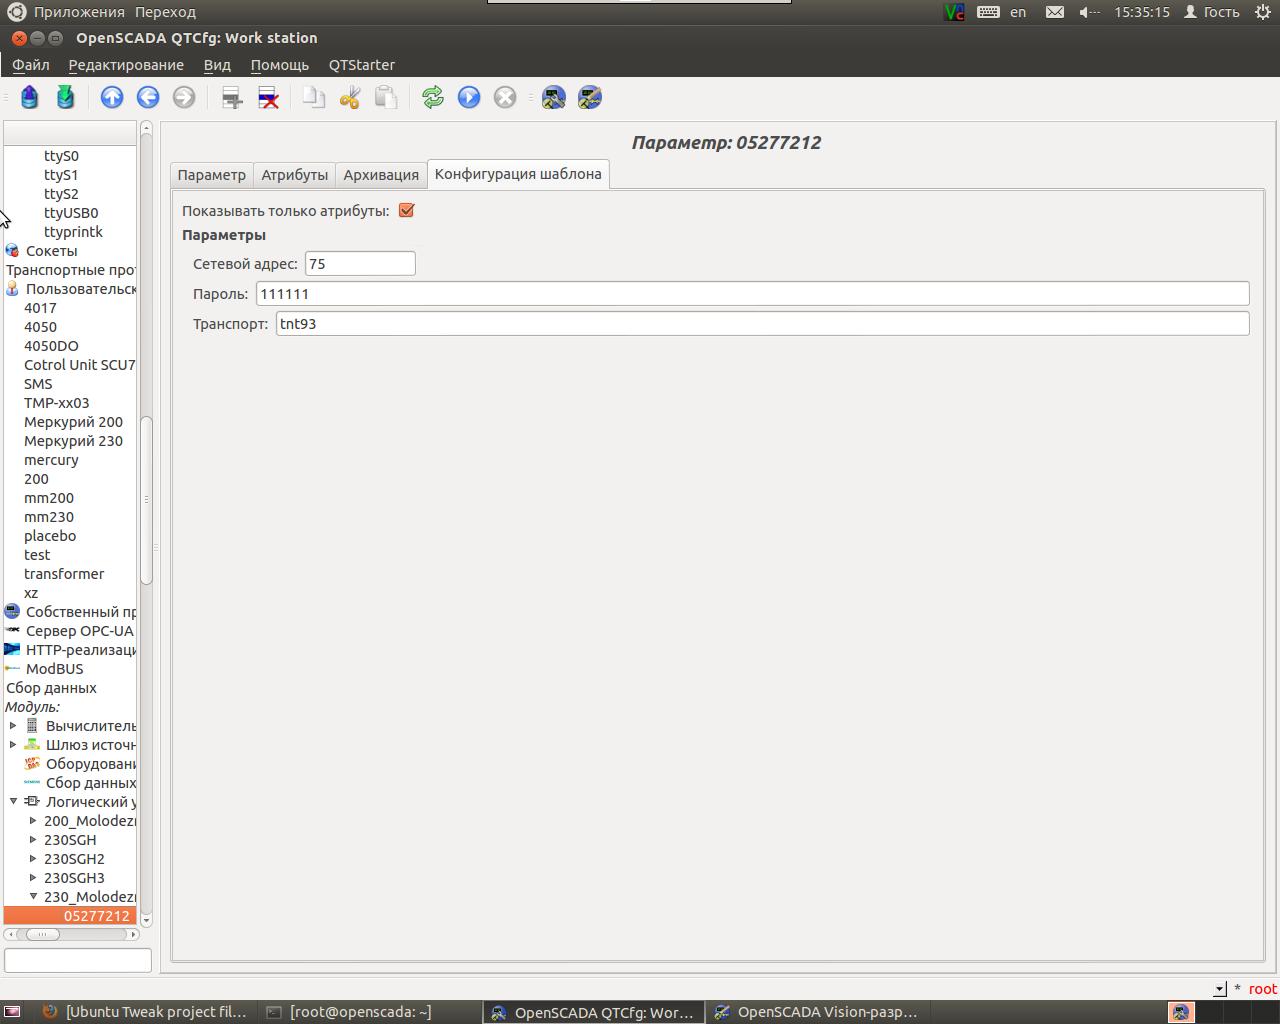 Пишем протоколы счетчиков Меркурий 230 и Меркурий 200 для OpenSCADA - 9